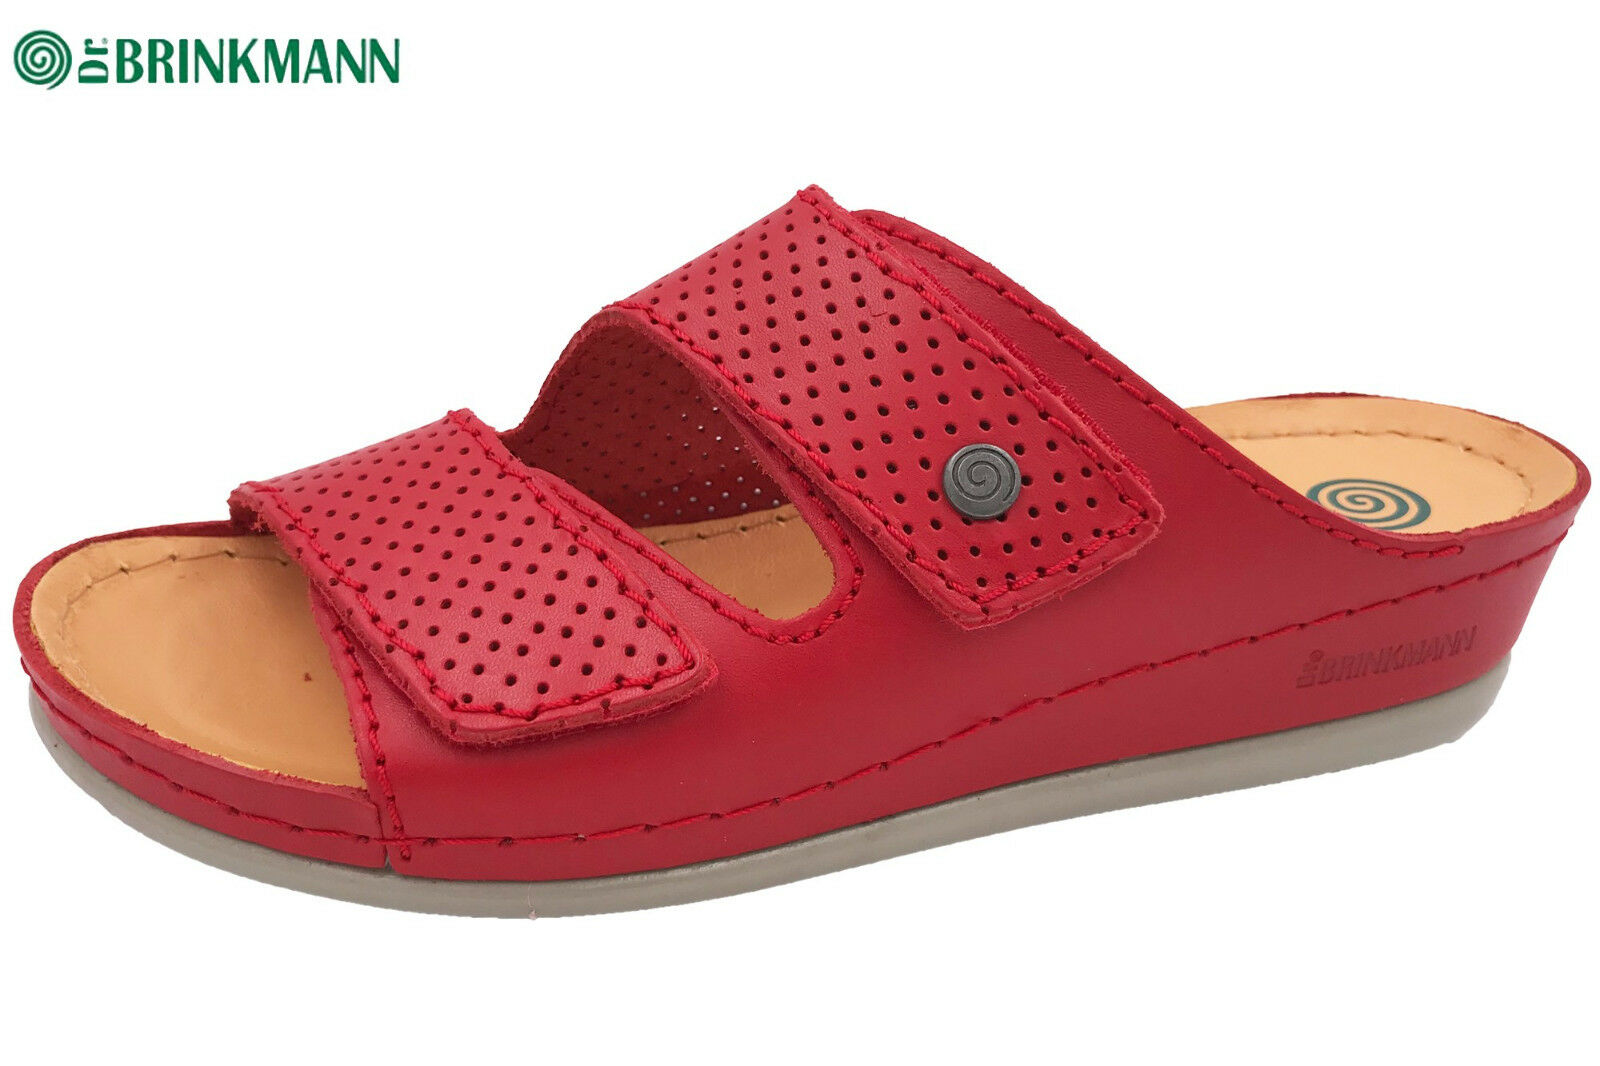 Dr. Brinkmann Damen Pantolette Rot Leder Naturform Fußbett NEU 700568-4